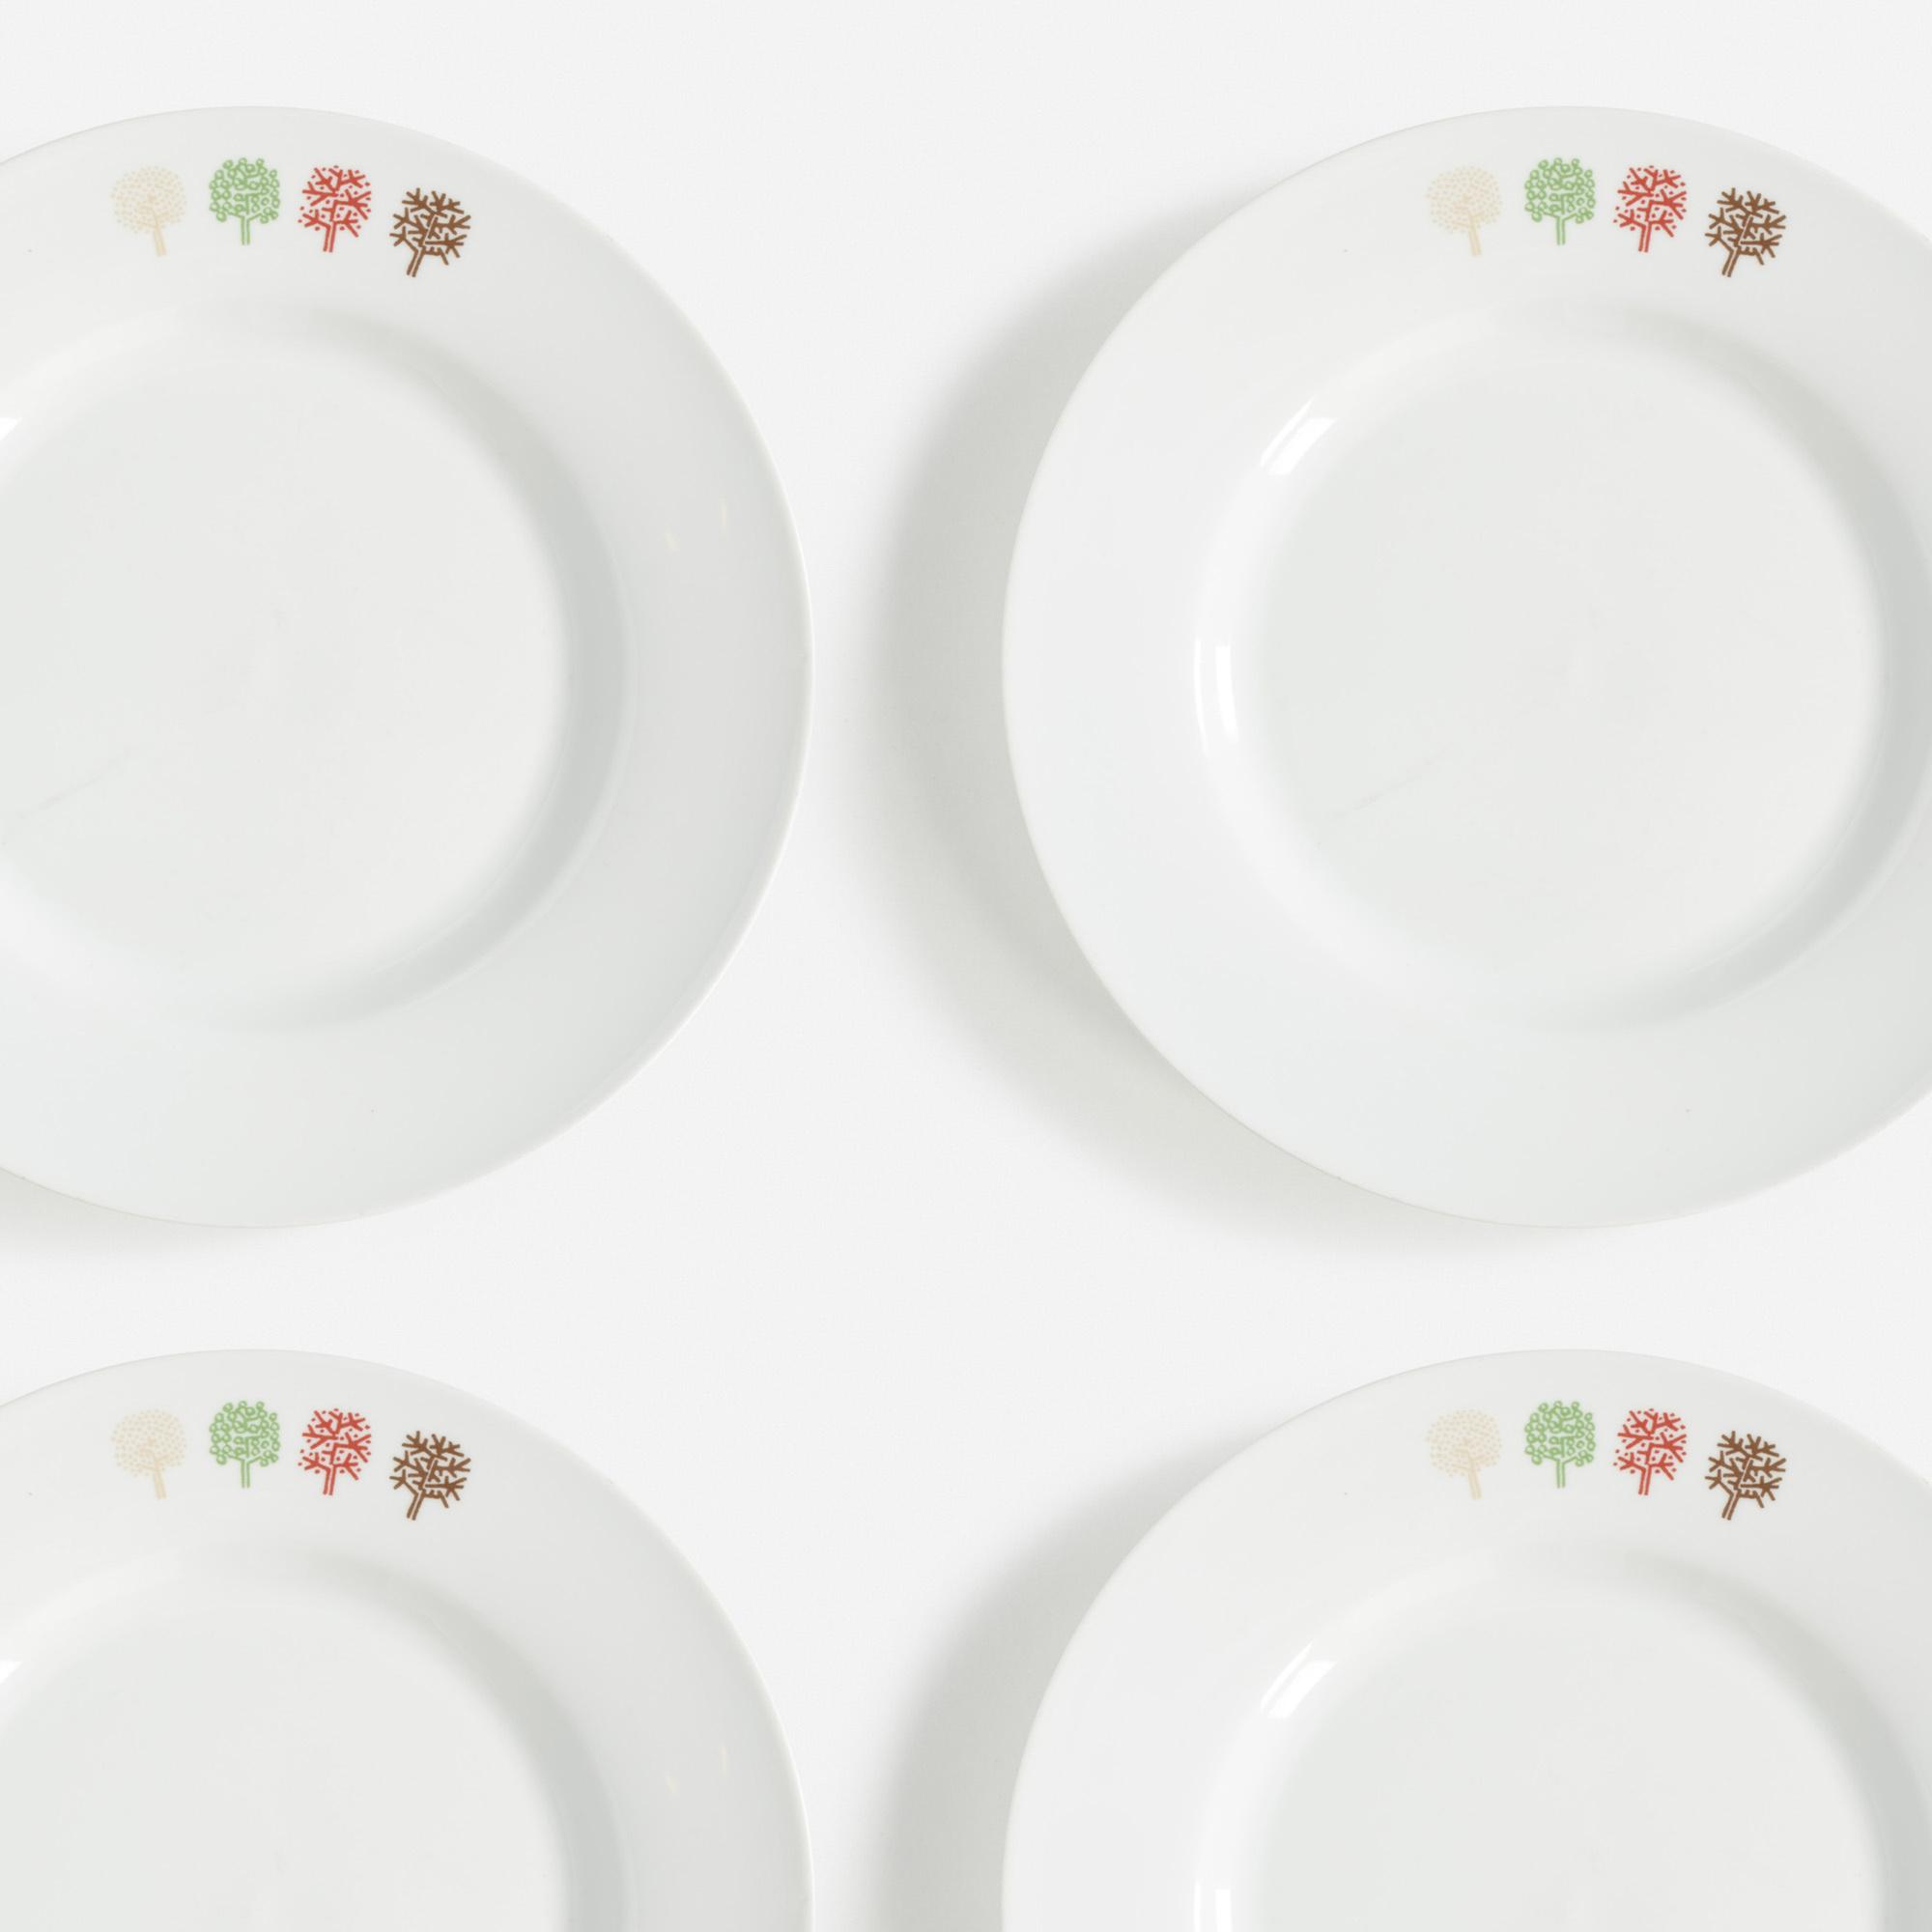 601:  / Four Seasons plates, set of twelve (1 of 1)